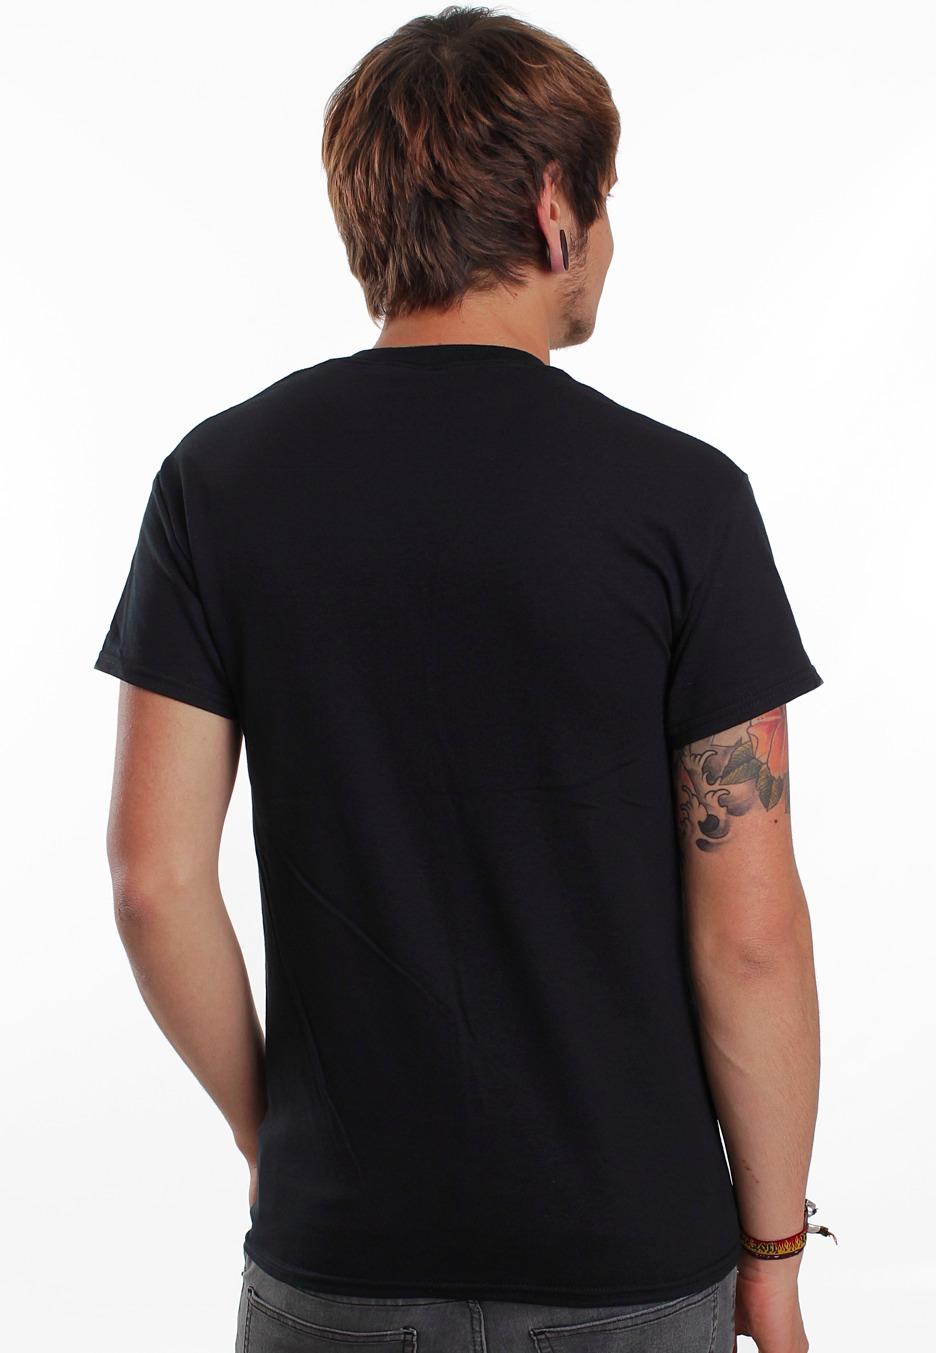 chelsea grin wolf t shirt official metalcore merchandise shop worldwide. Black Bedroom Furniture Sets. Home Design Ideas